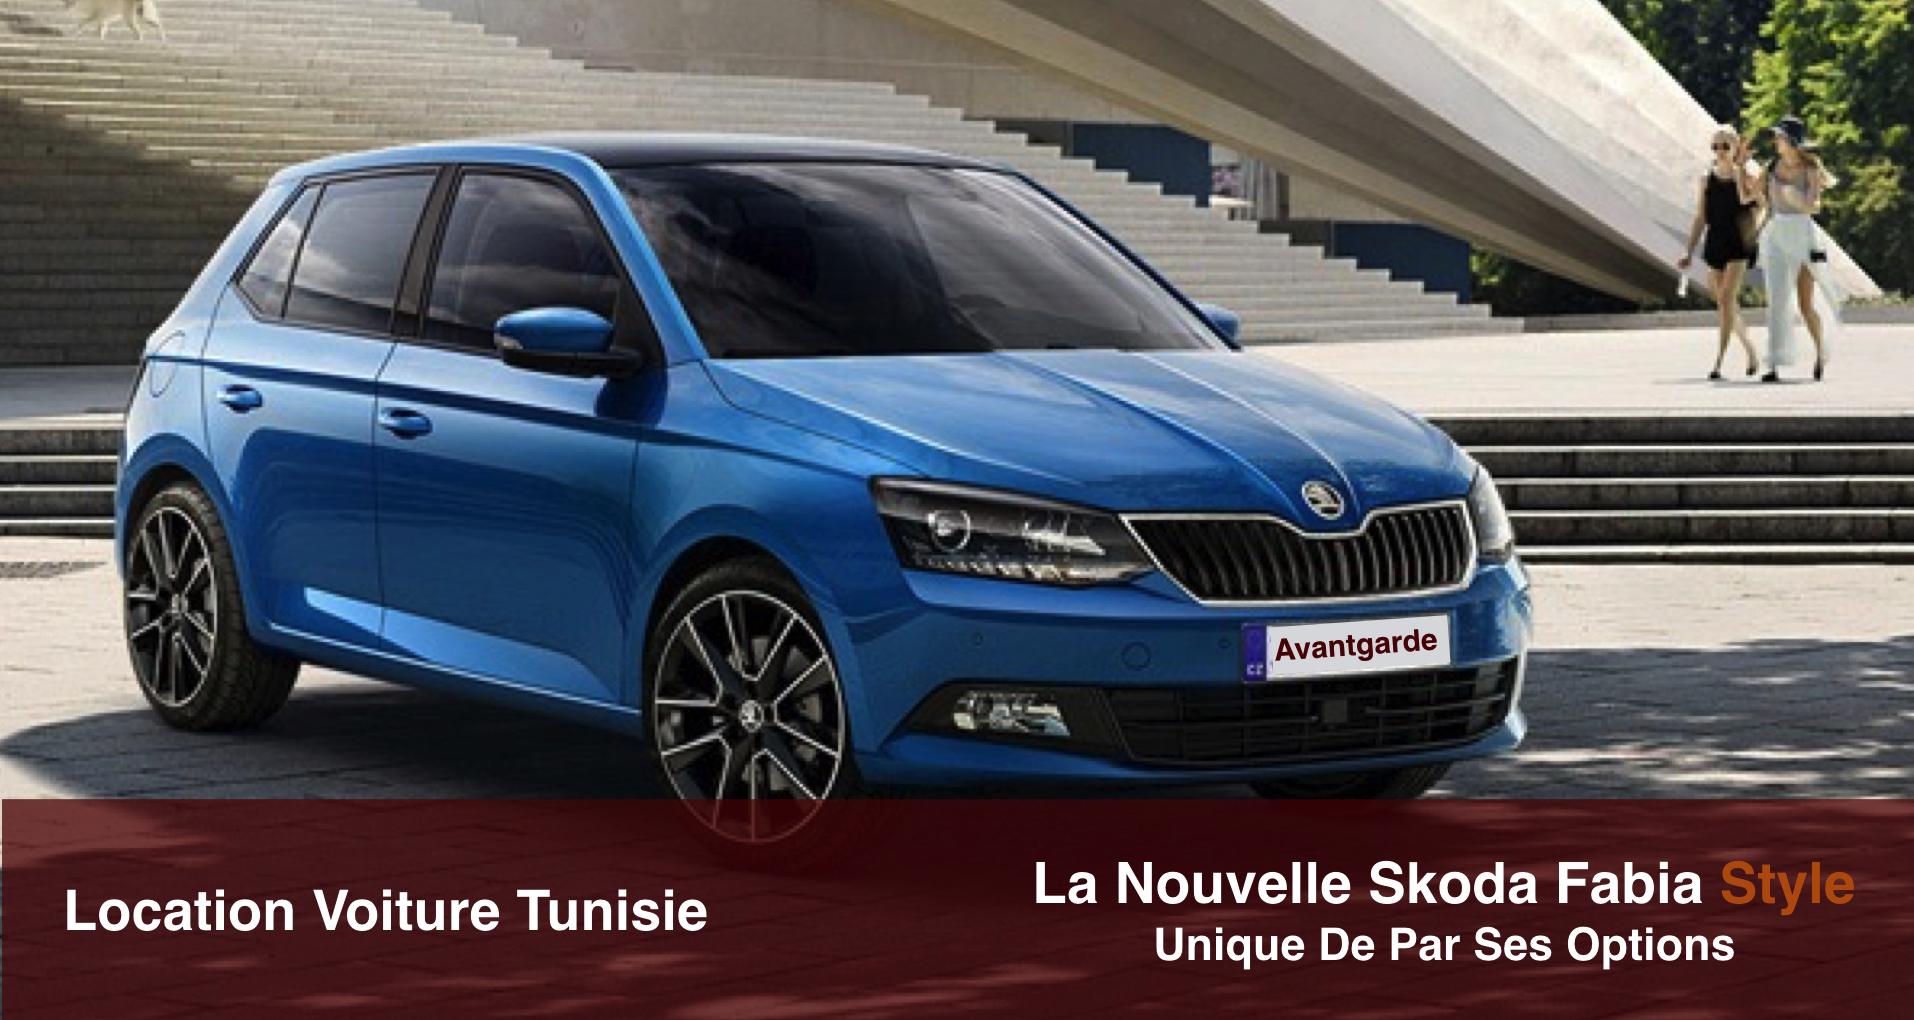 promotion location voiture tunisie r duction avantgarde. Black Bedroom Furniture Sets. Home Design Ideas